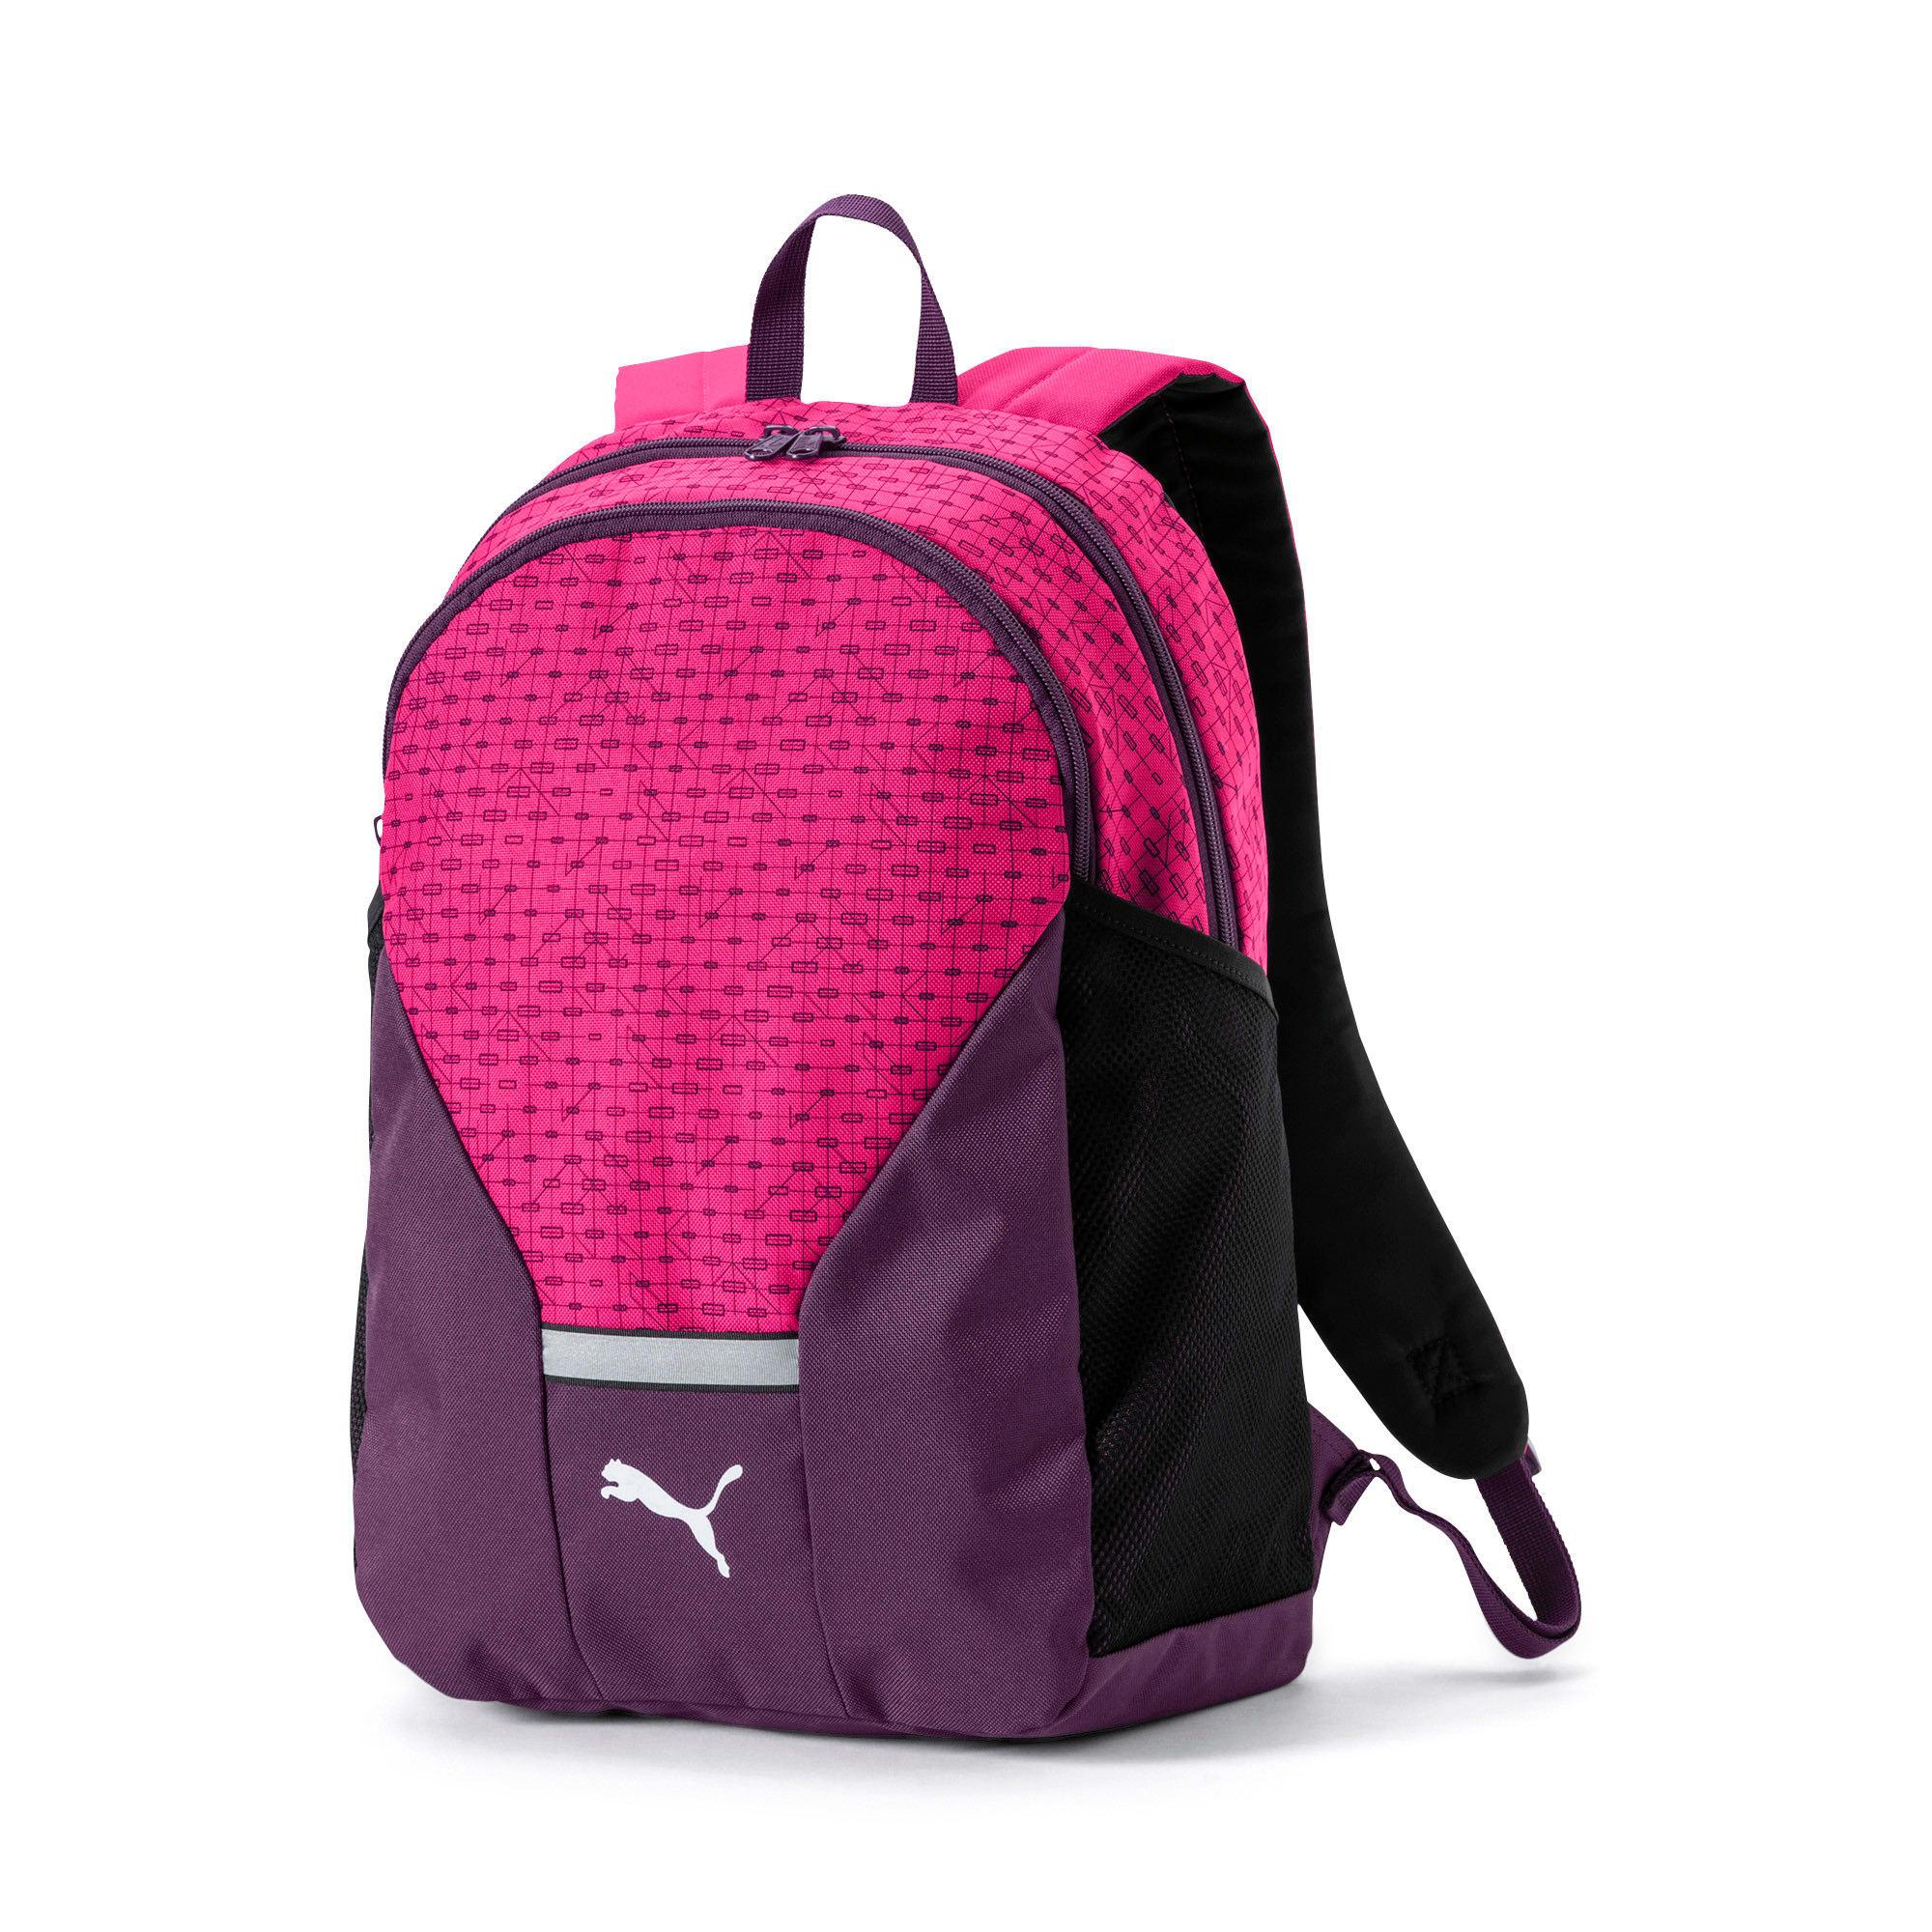 Thumbnail 1 of Beta Backpack, Beetroot Purple-Shadow Purpl, medium-IND